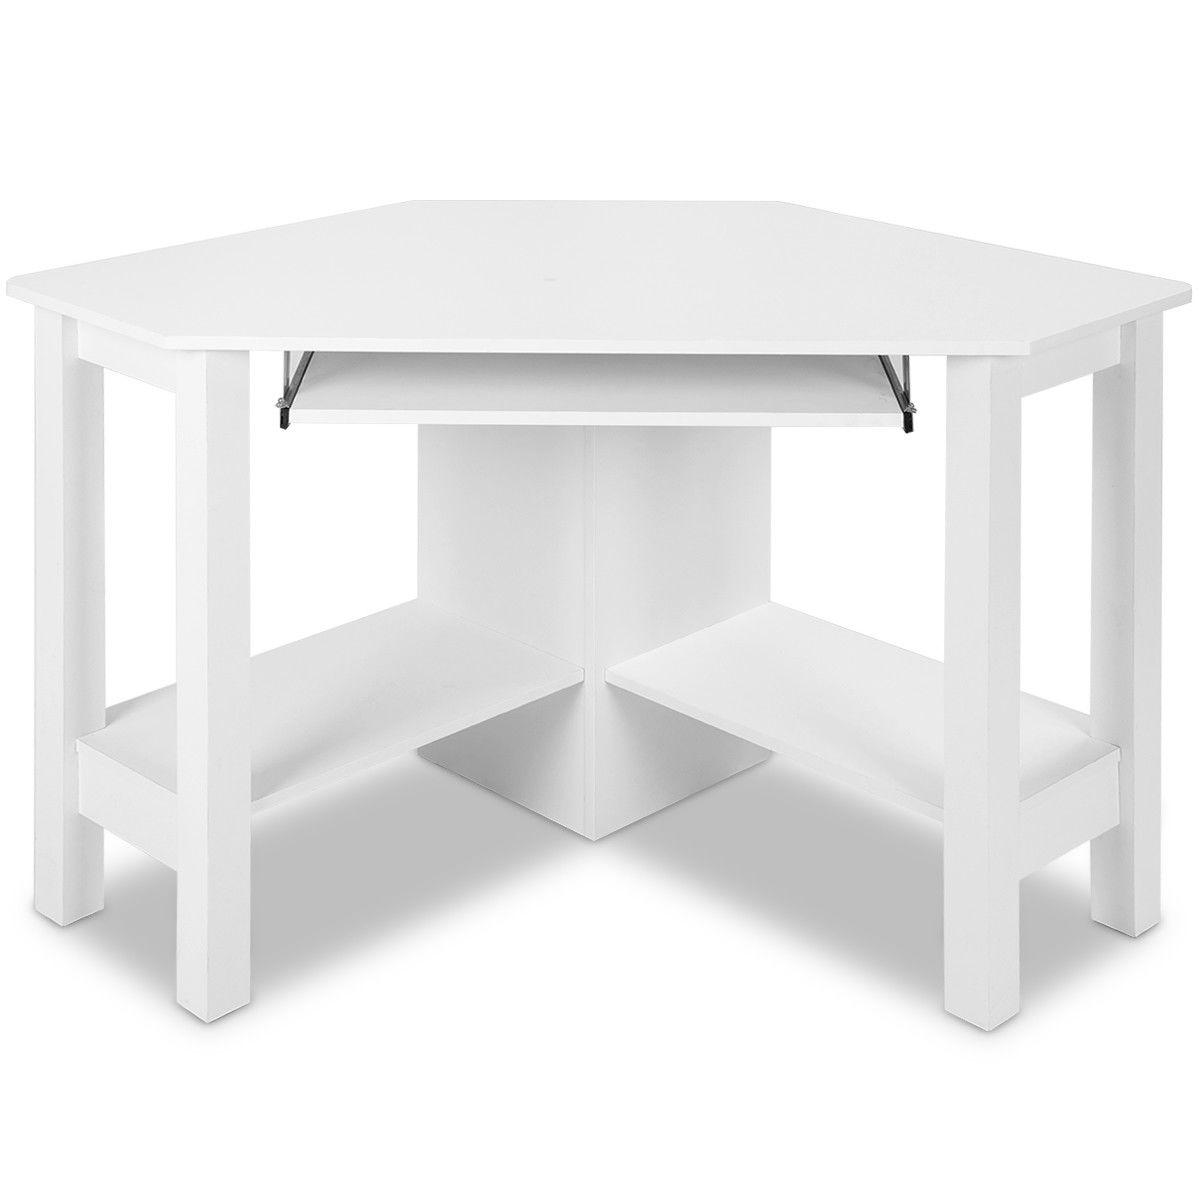 Costway Wooden Corner Desk With Drawer Computer Pc Table Study Office Room White Walmart Com Walmart Com